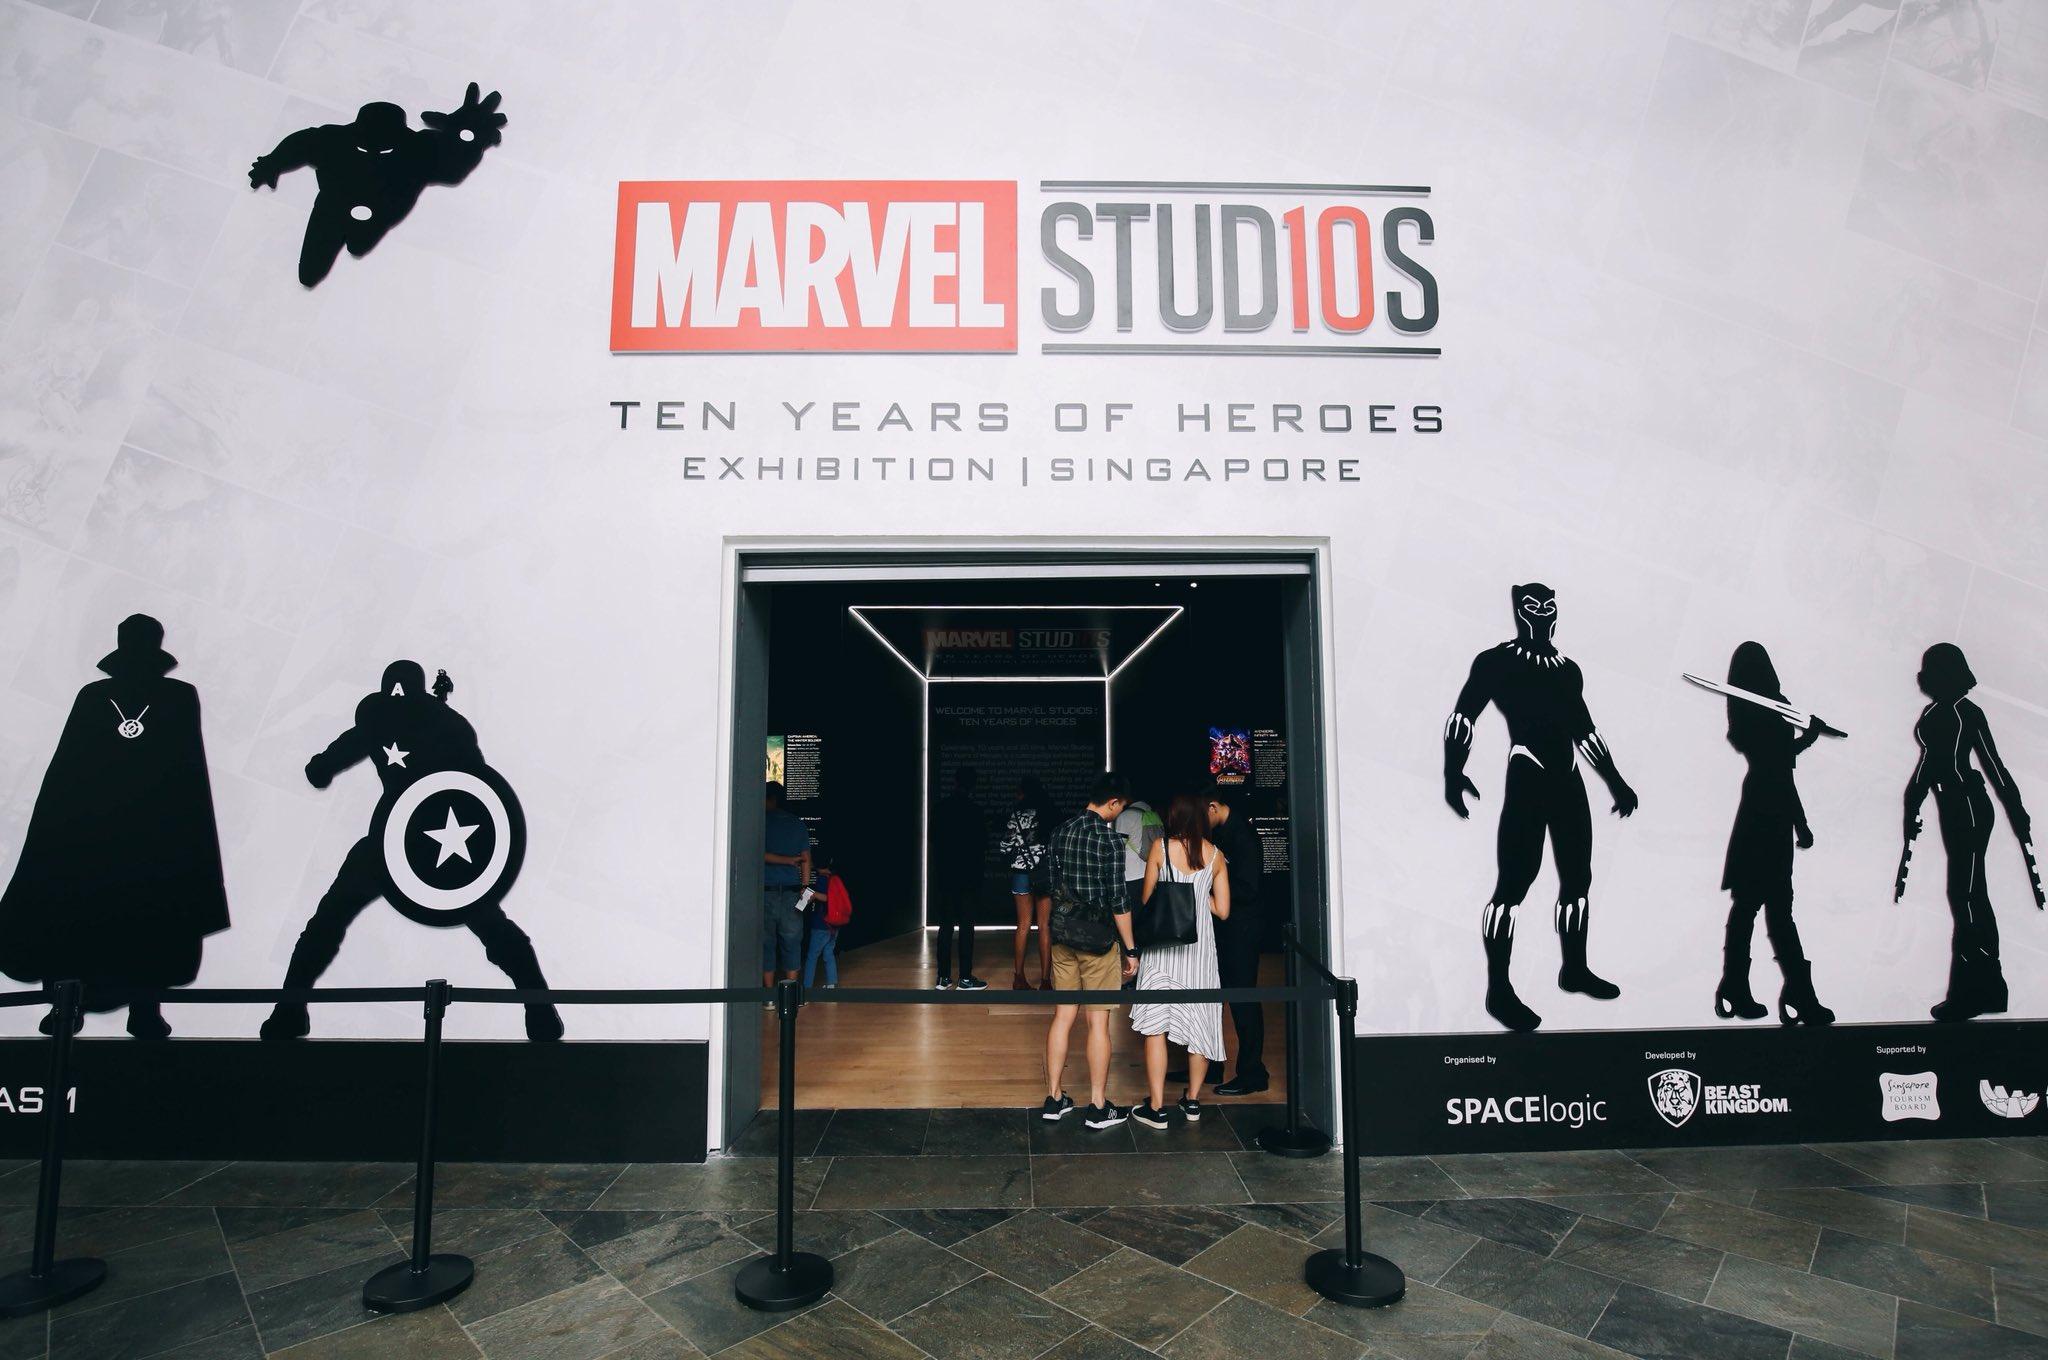 Marvel Studios: Ten Years of Heroes exhibition at ArtScience Museum till 30 Sep https://t.co/RRzl0peObV